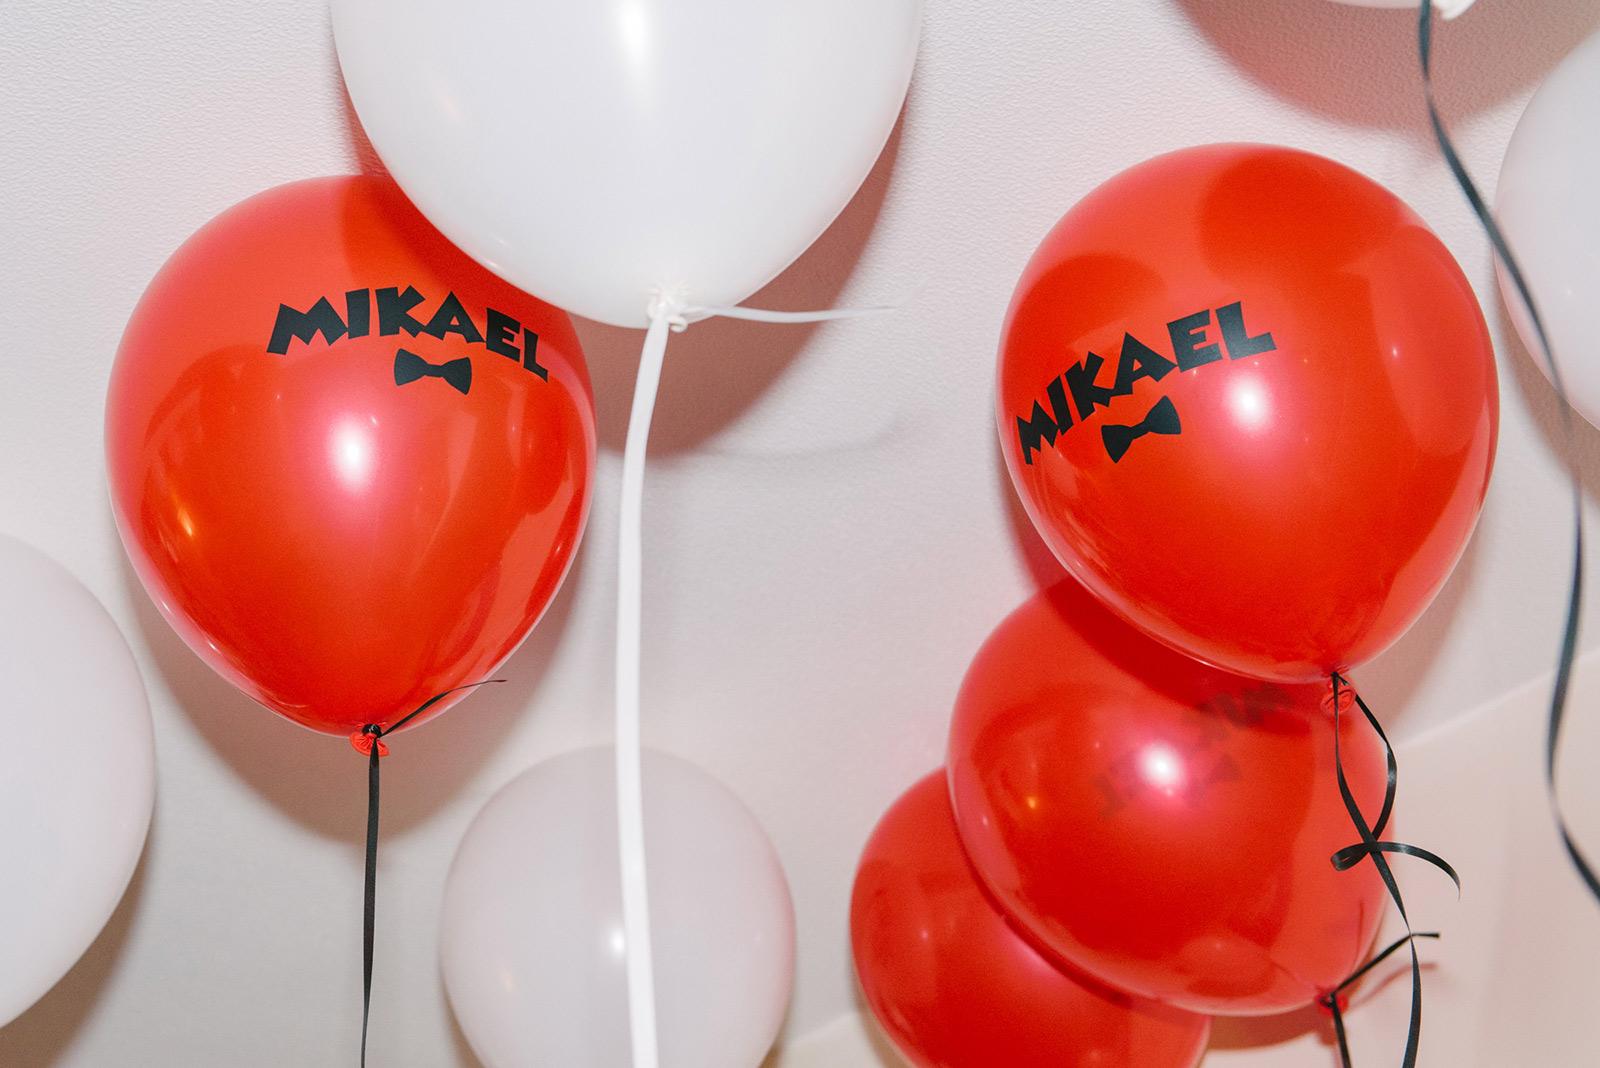 Ls ballons d'anniversaire de Mikael